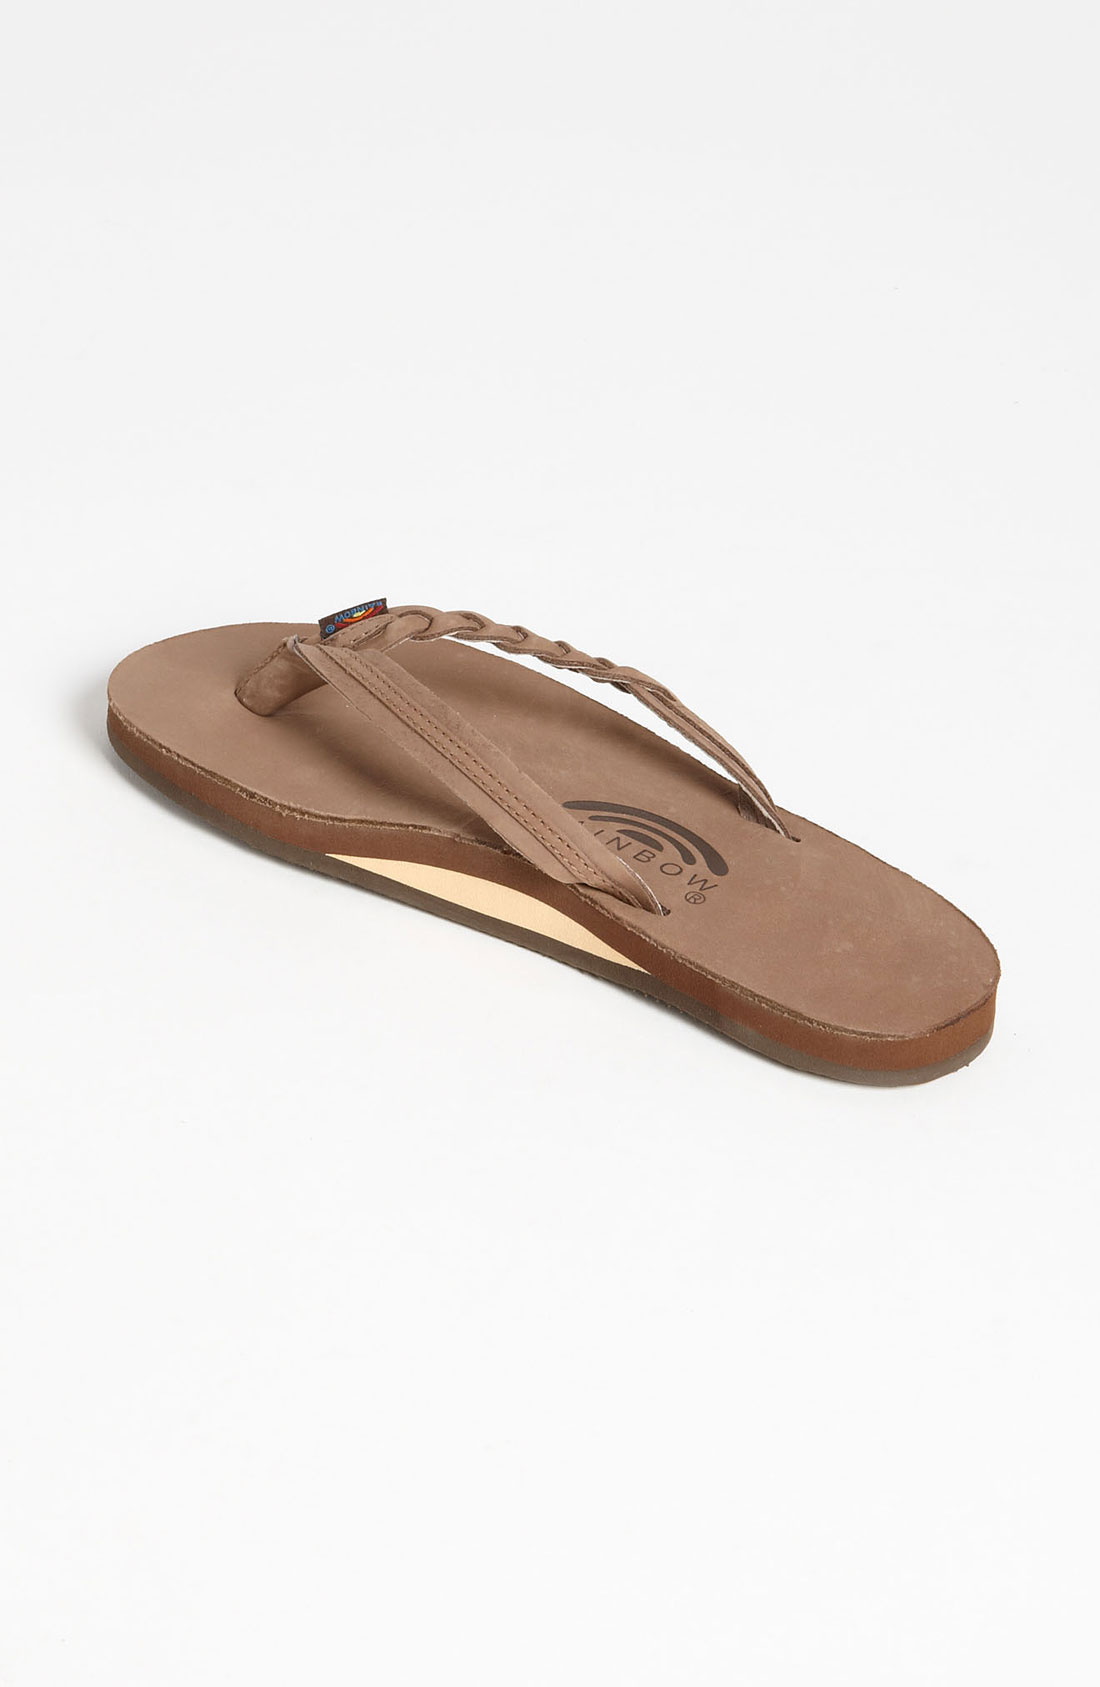 Rainbow Sandals Flirty Braided Leather Flip Flop In -3812